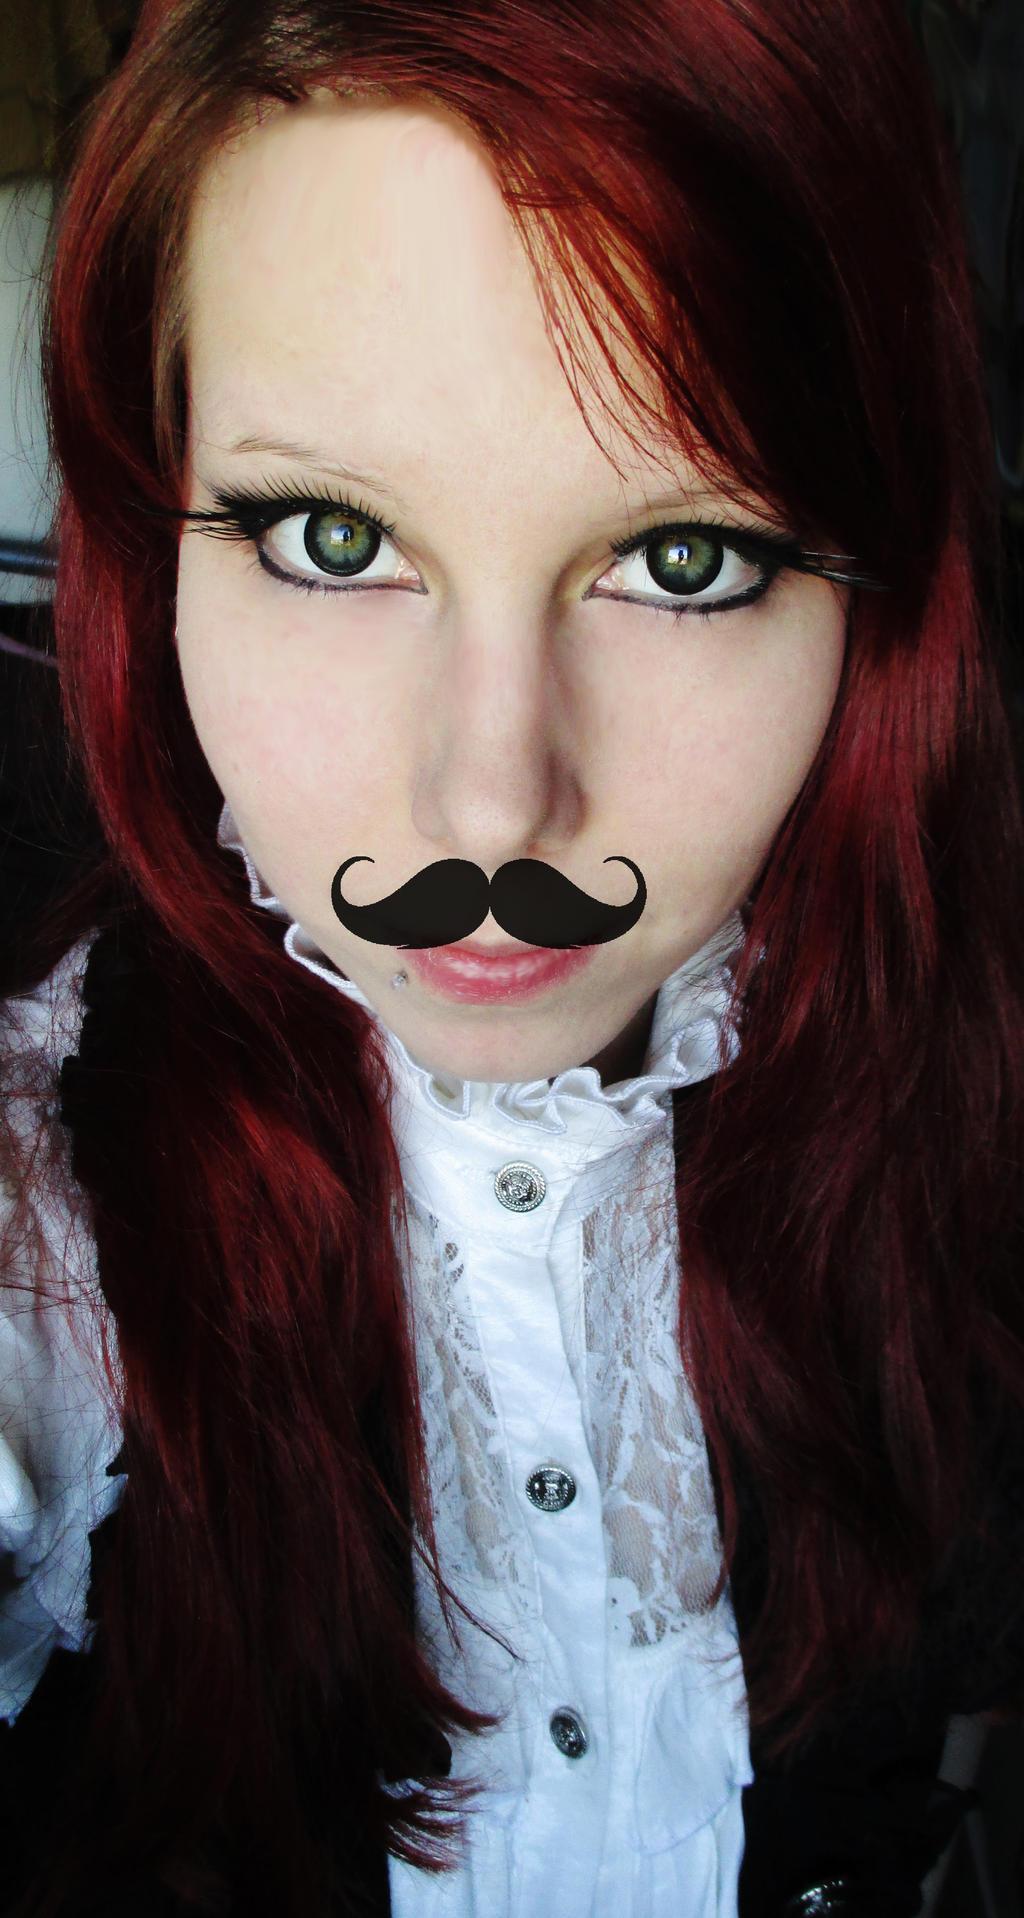 KamiSachiko's Profile Picture